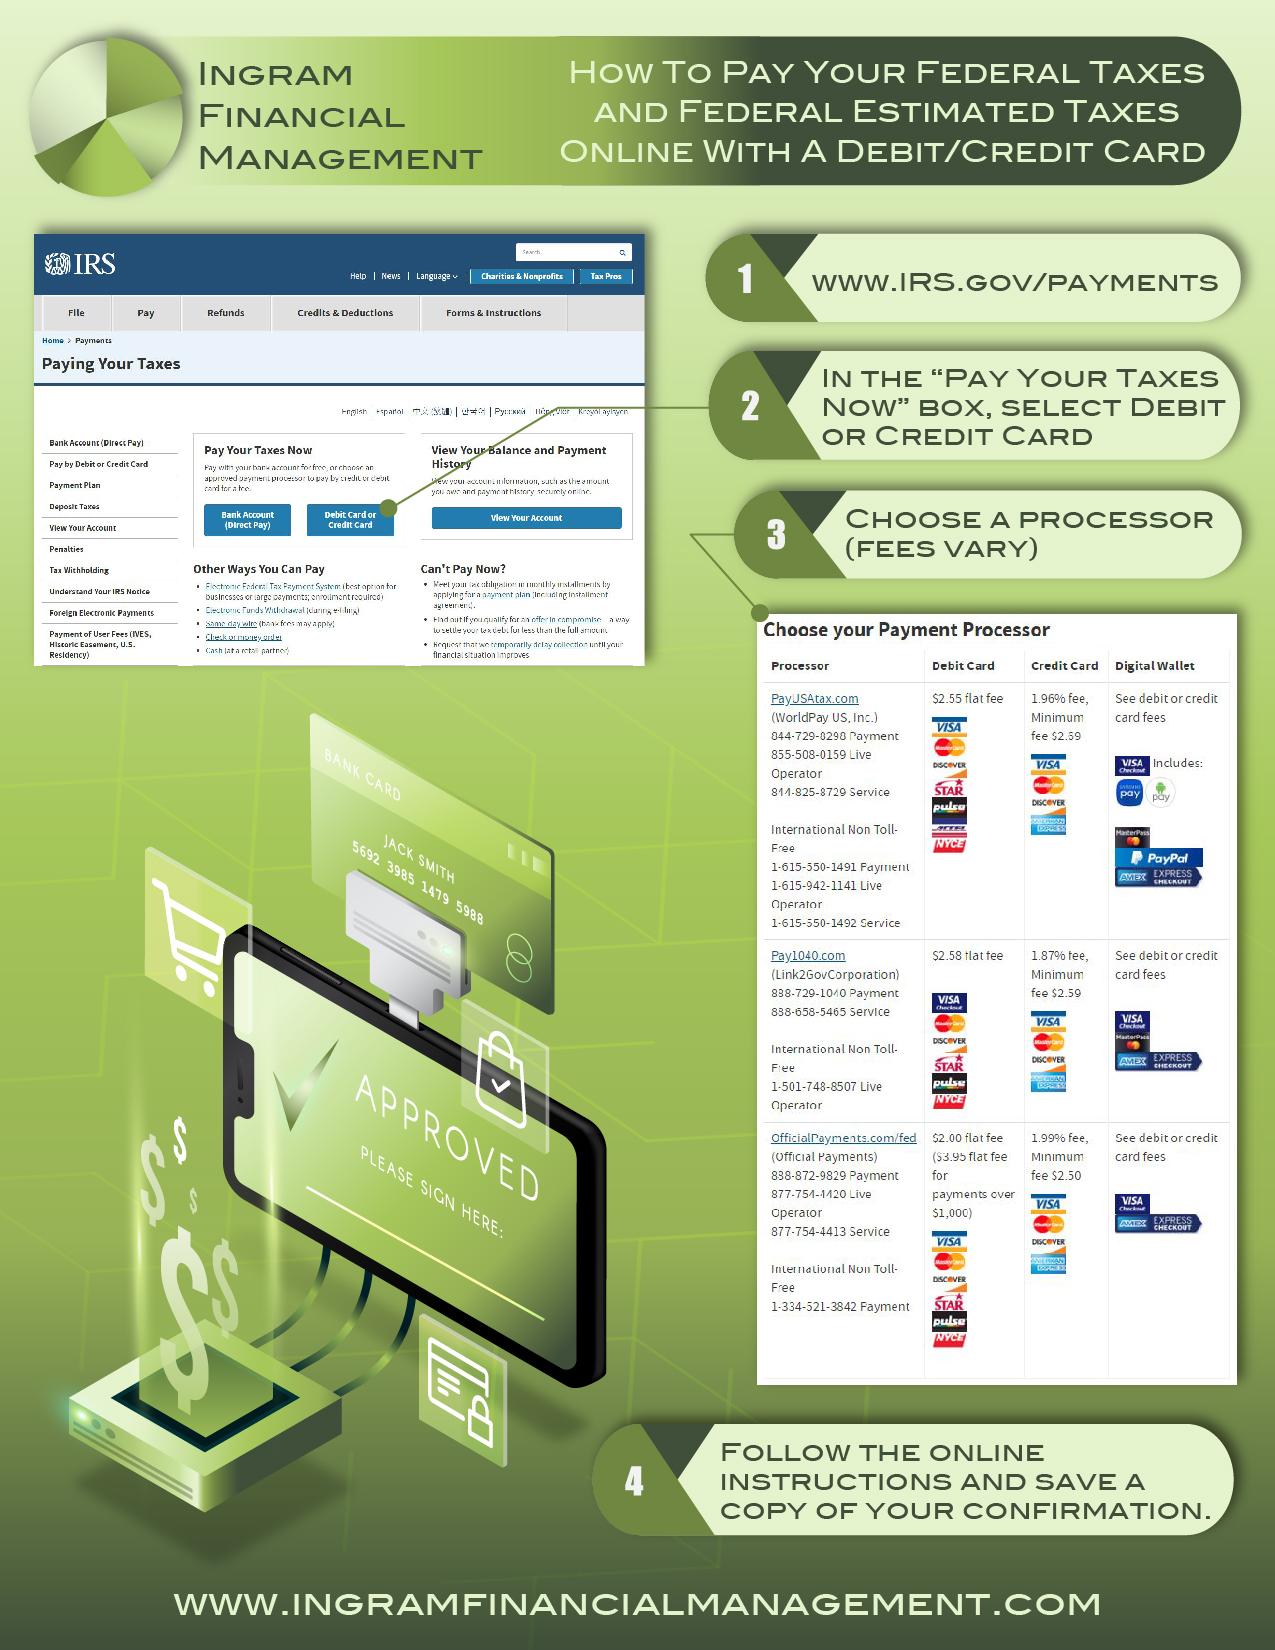 Ingram Financial Management Online CC Payment